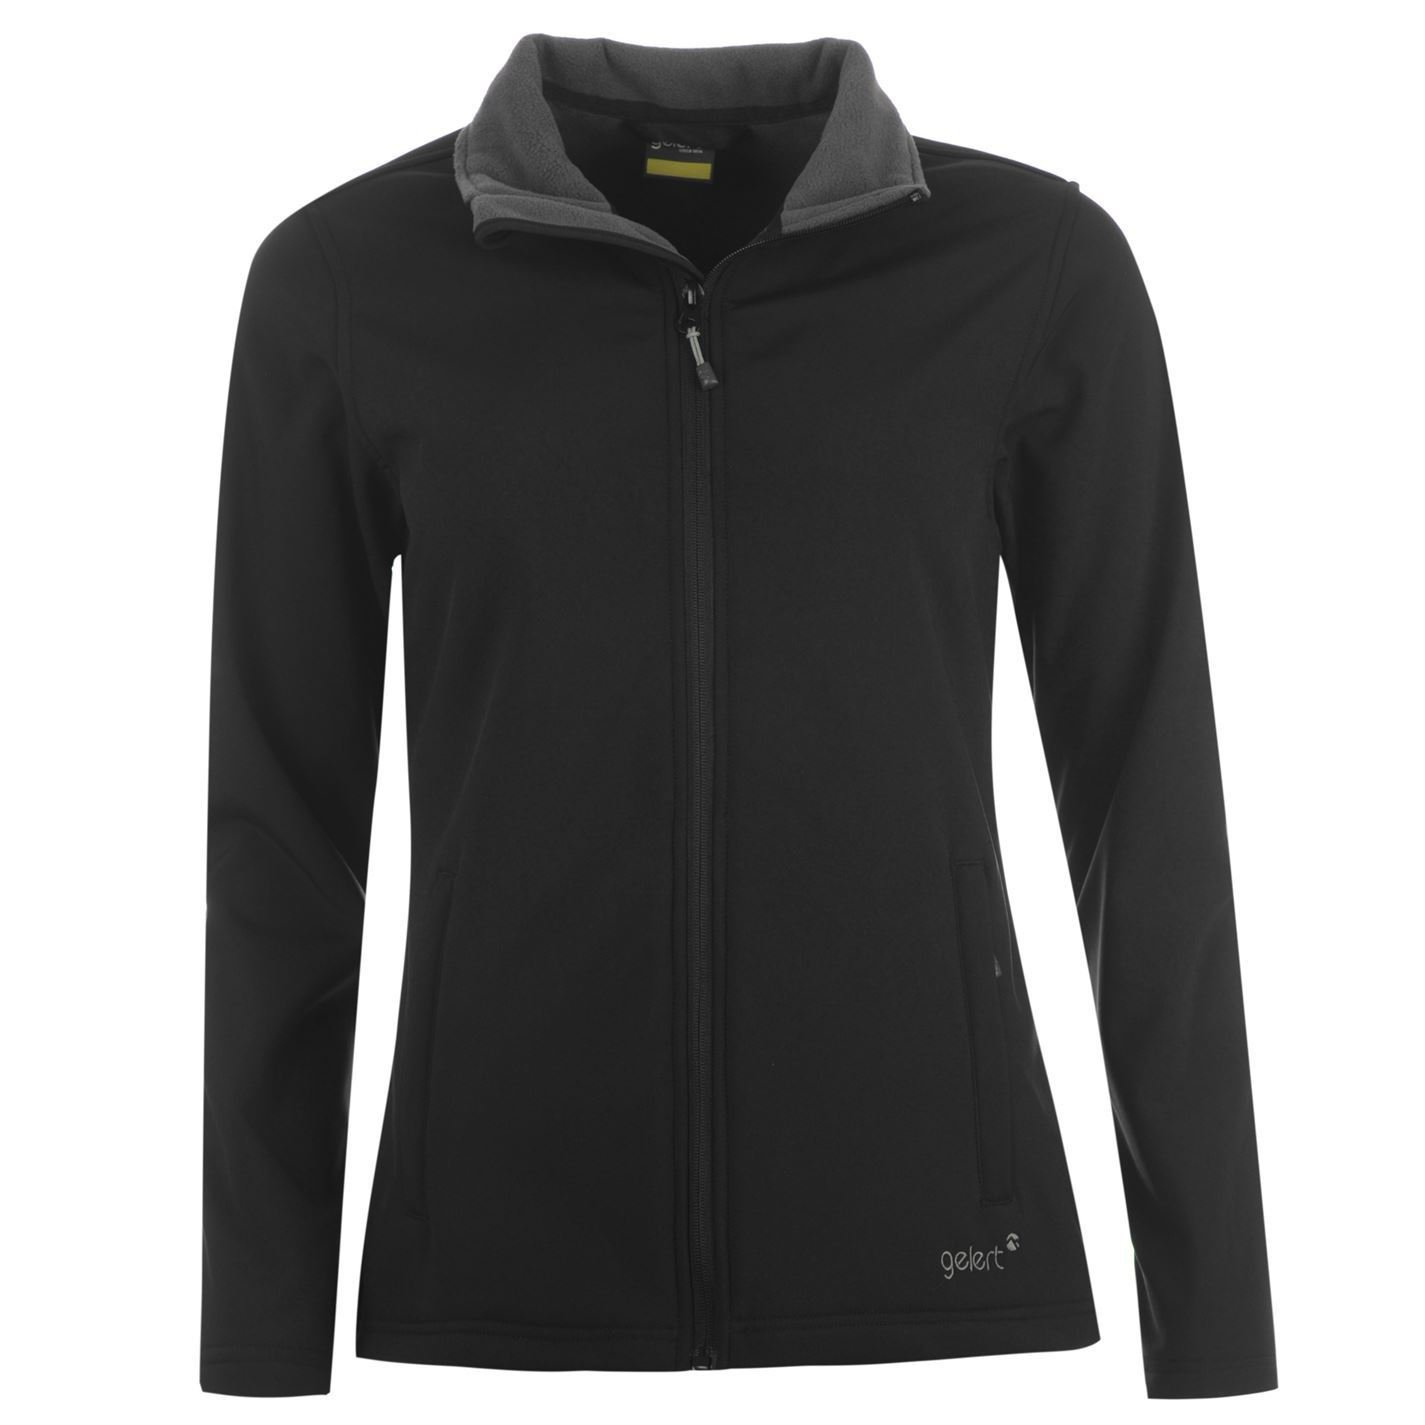 Gelert Womens Softshell Jacket Full Length Zip Pockets Inner Fleece Lining